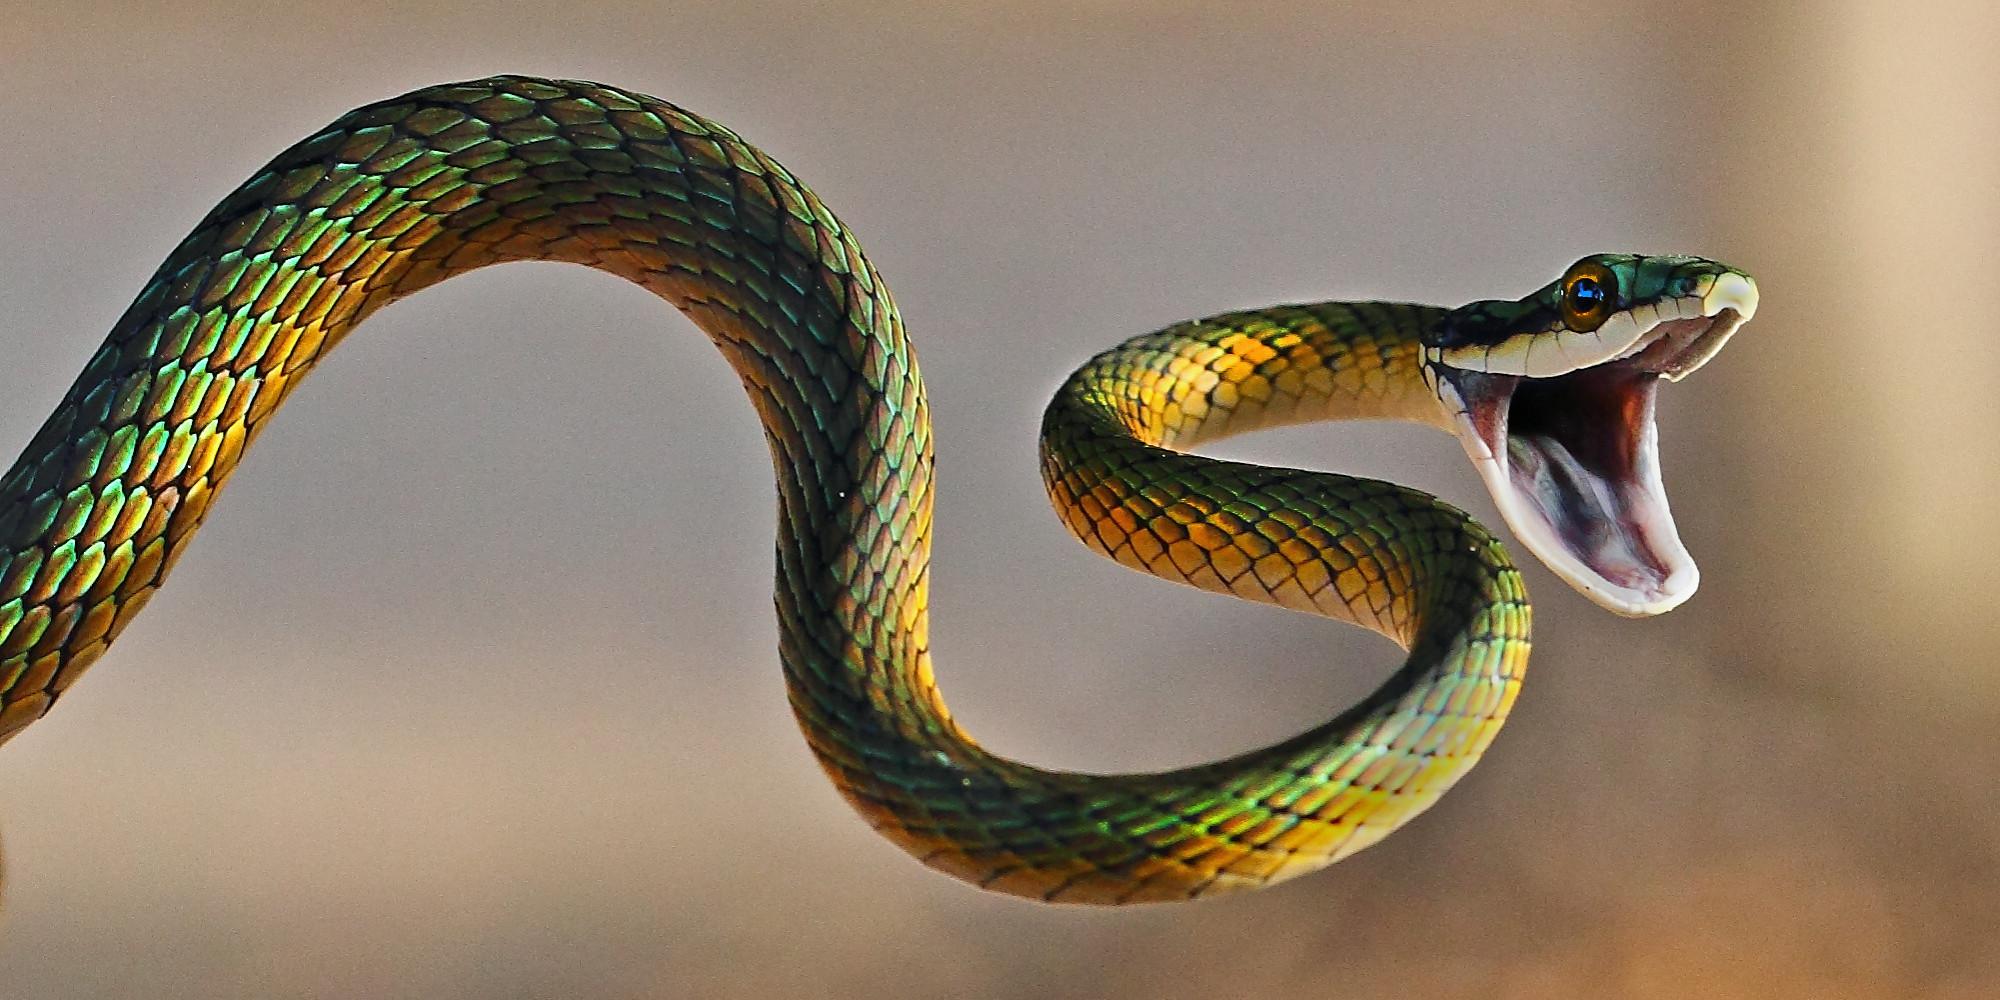 Snakes in Alabama